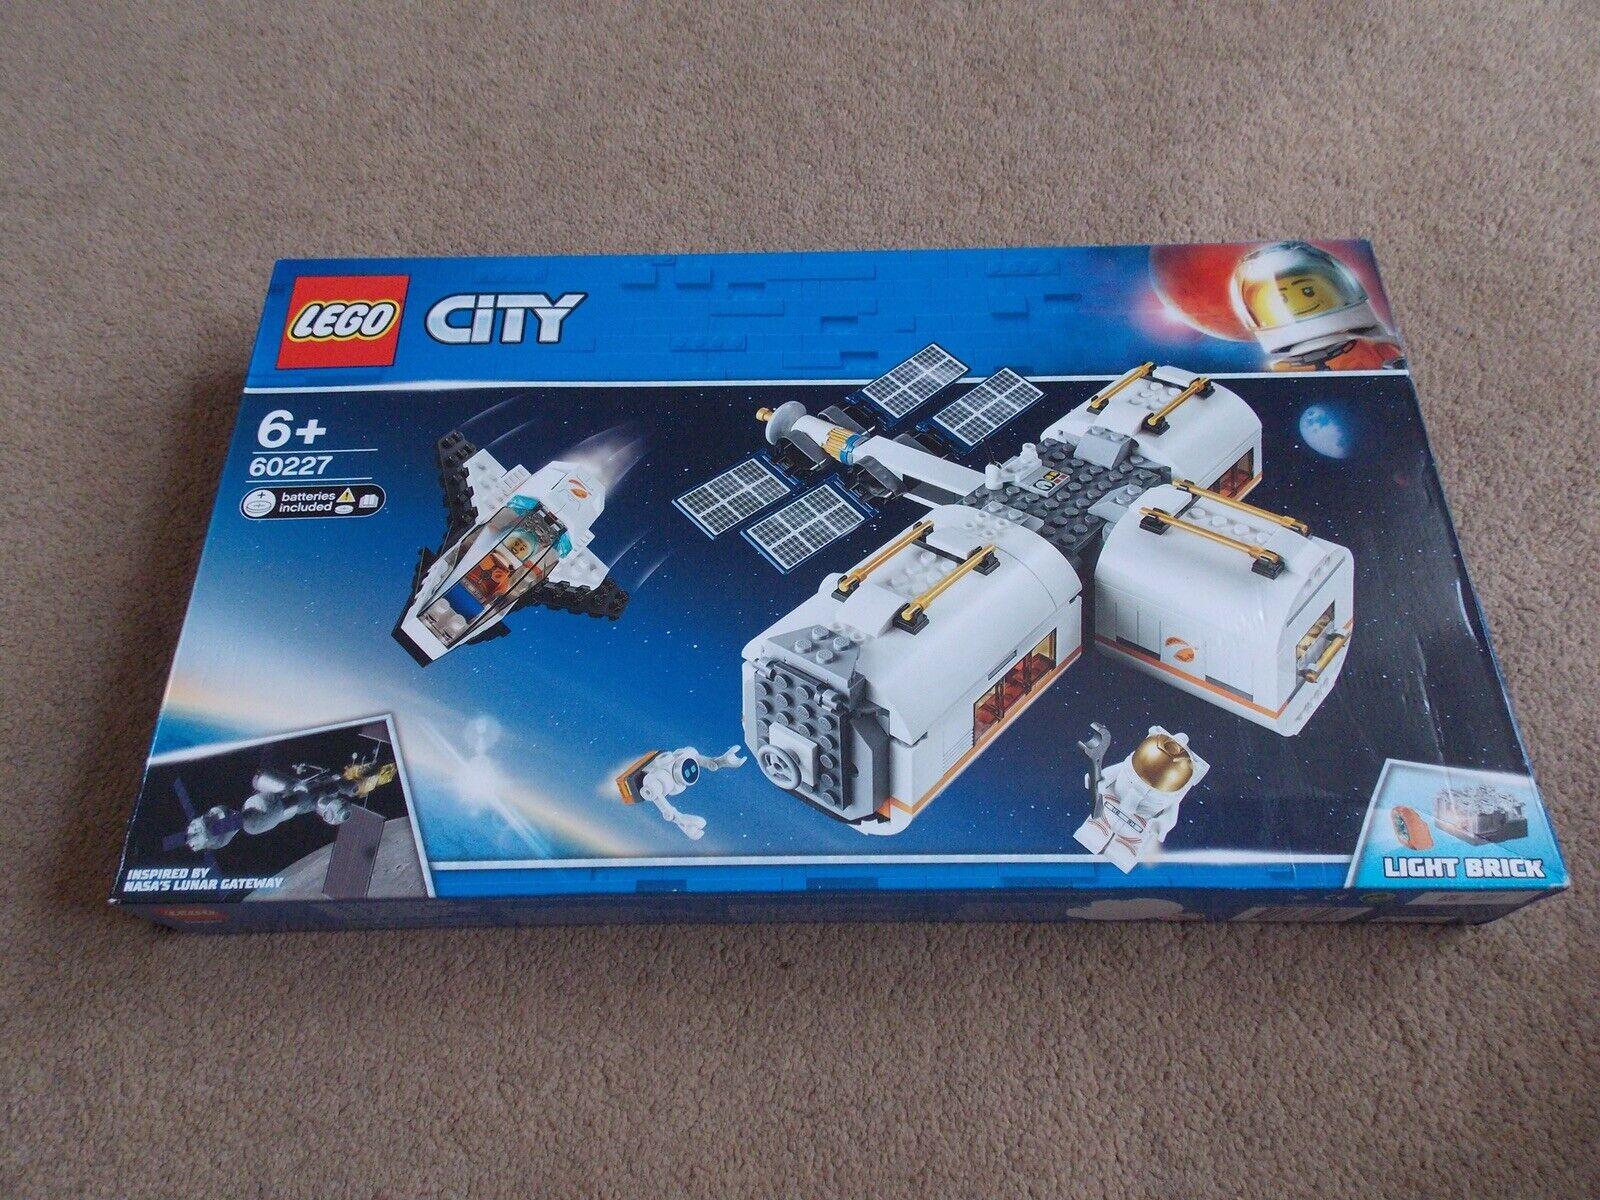 LEGO-città (Set 60227-Stazione spaziale lunare) Nuovo  di Zecca  fantastica qualità